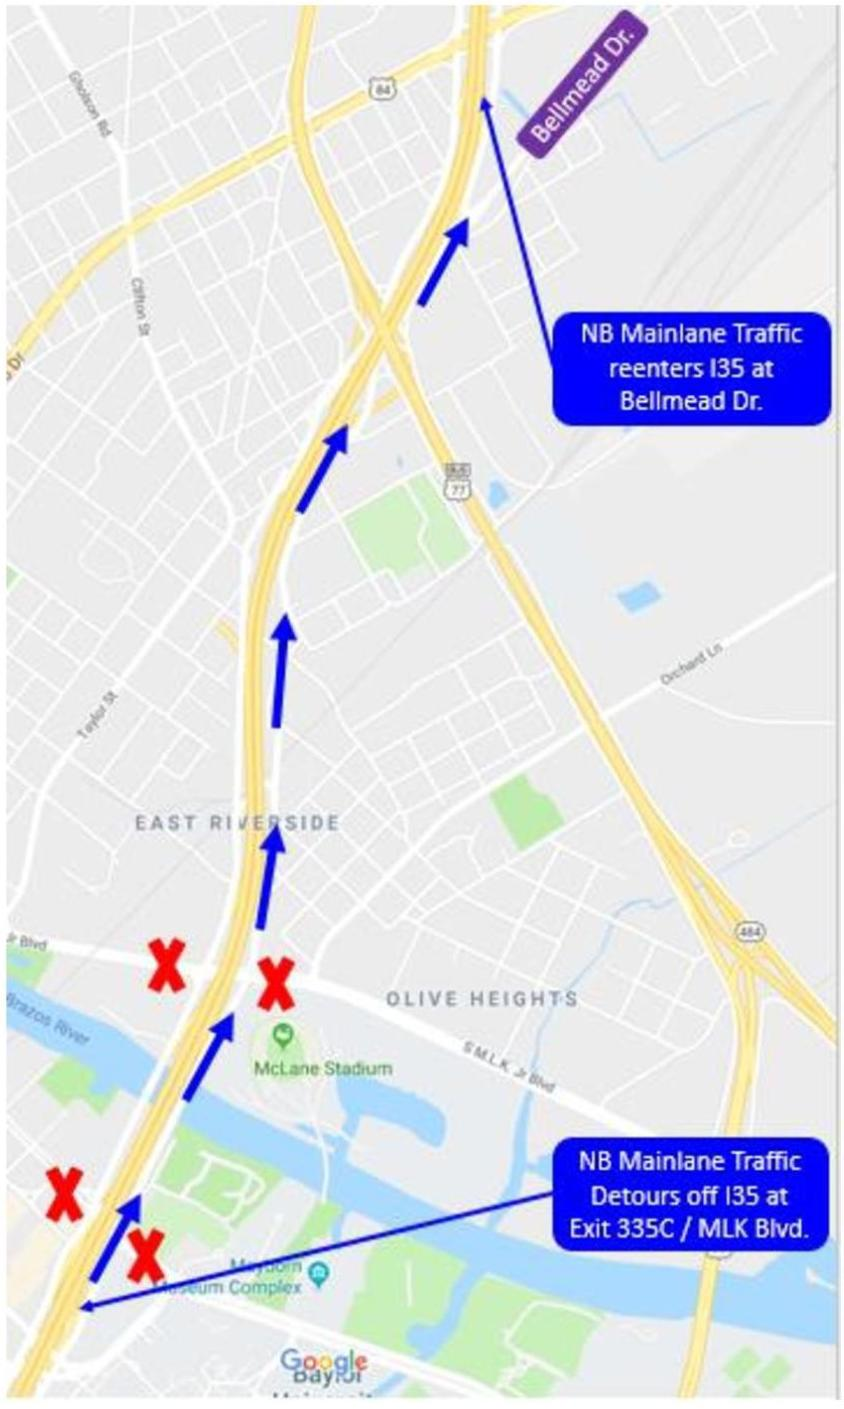 I-35 to close at Forrest Street overnight Wednesday, Thursday ... I Interstate Map on i-35 oklahoma map, united states road map, i 65 mile marker map, i-35 highway, i-35 texas, us route 50 map, i-35 dallas, us highway 10 map,